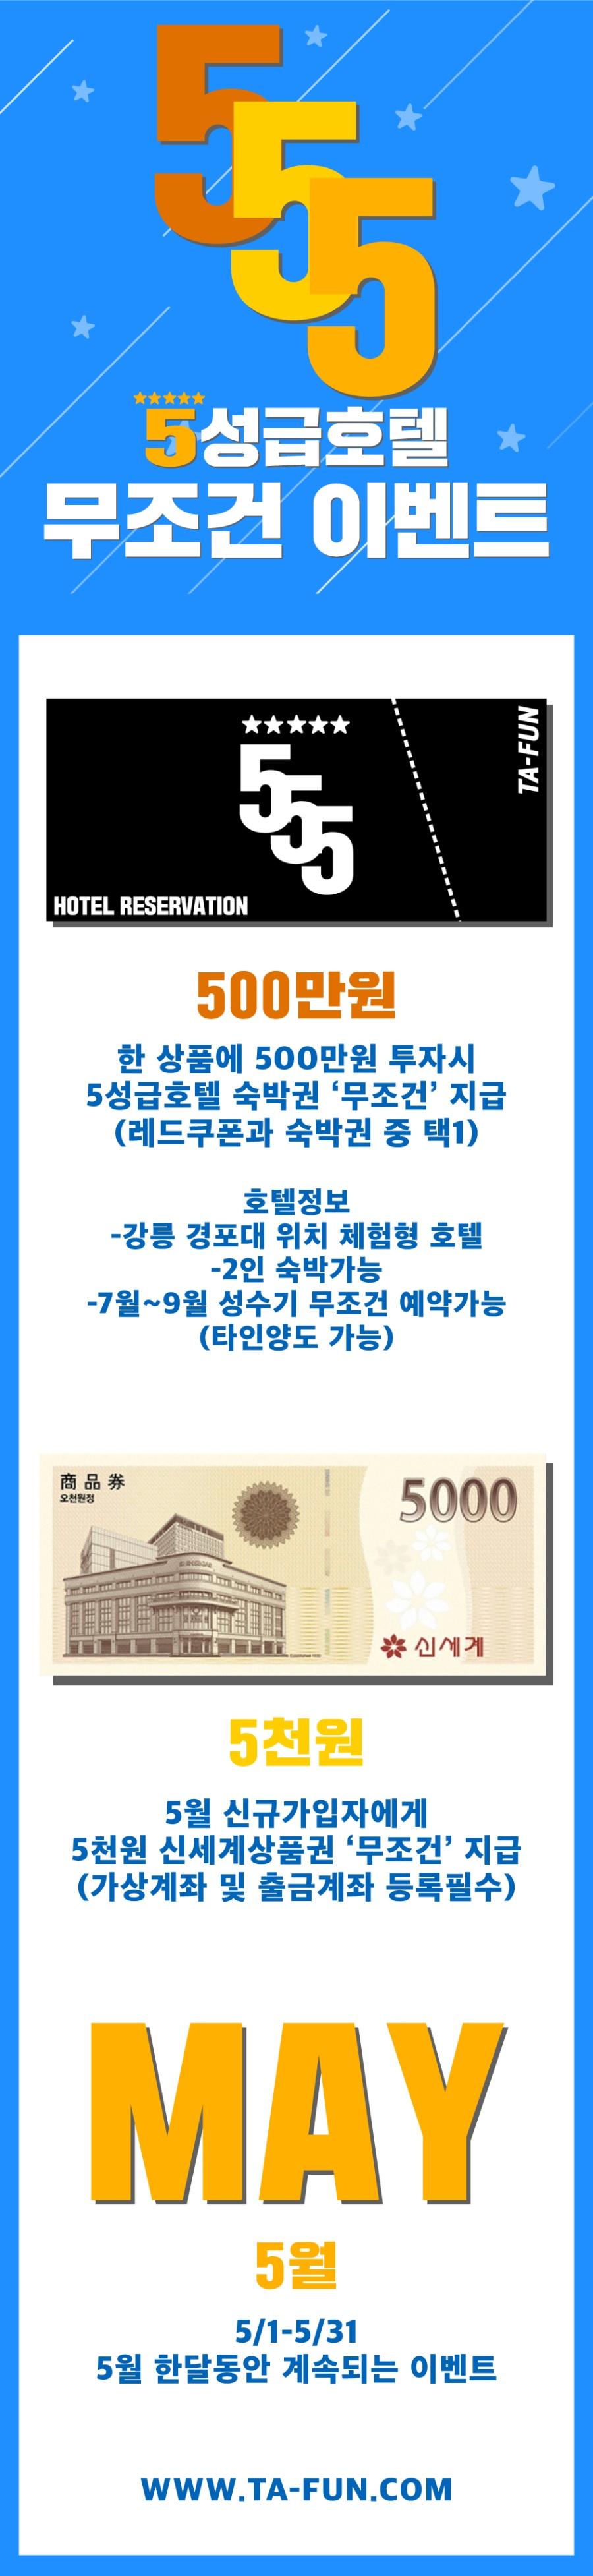 KakaoTalk_2018-05-01-11-14-07_Photo_47.jpeg